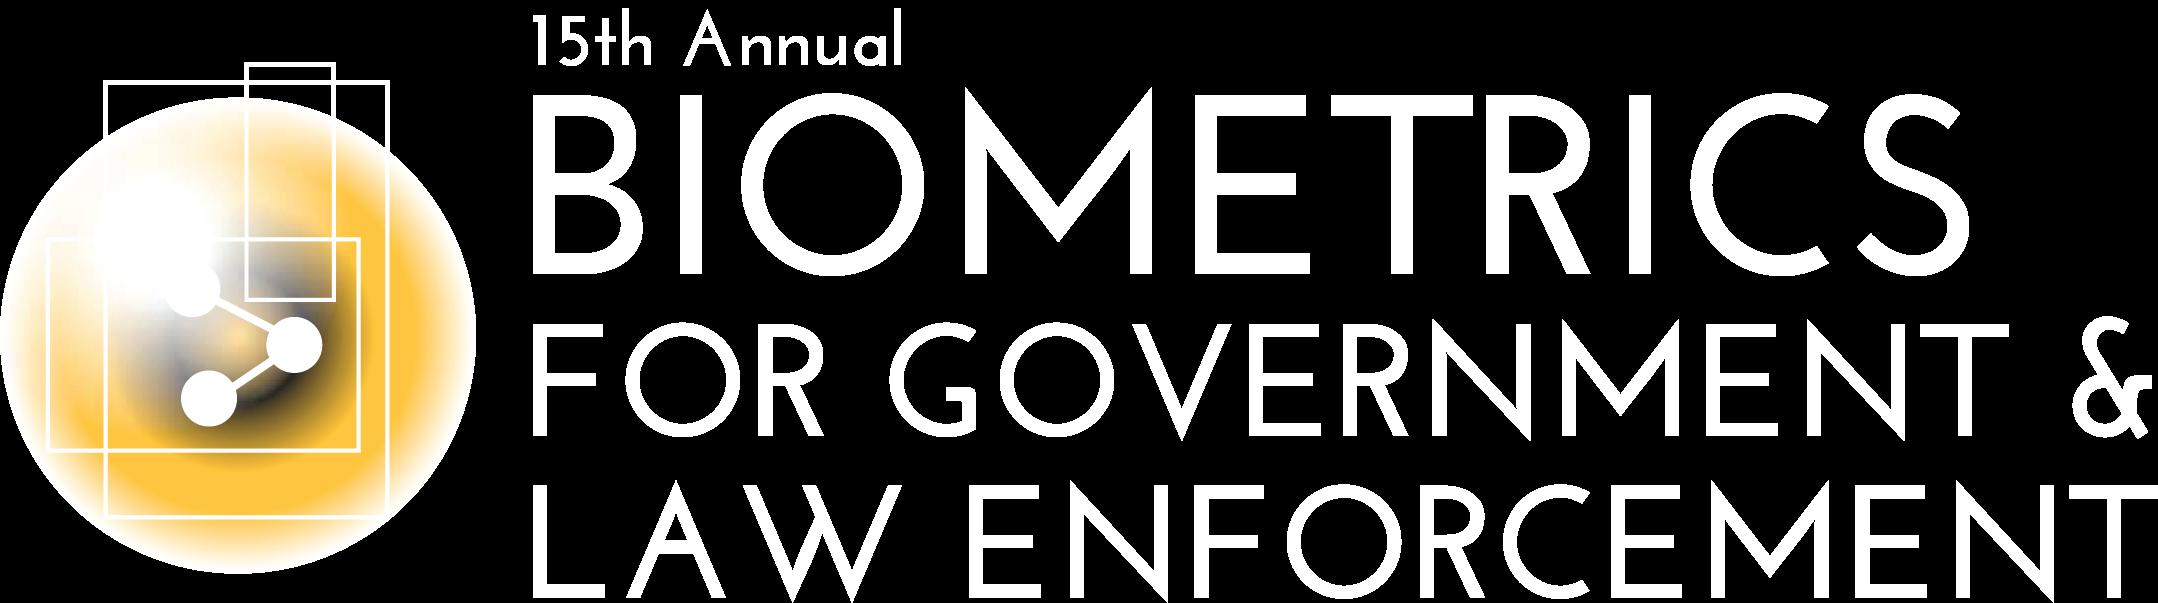 Biometrics for Government